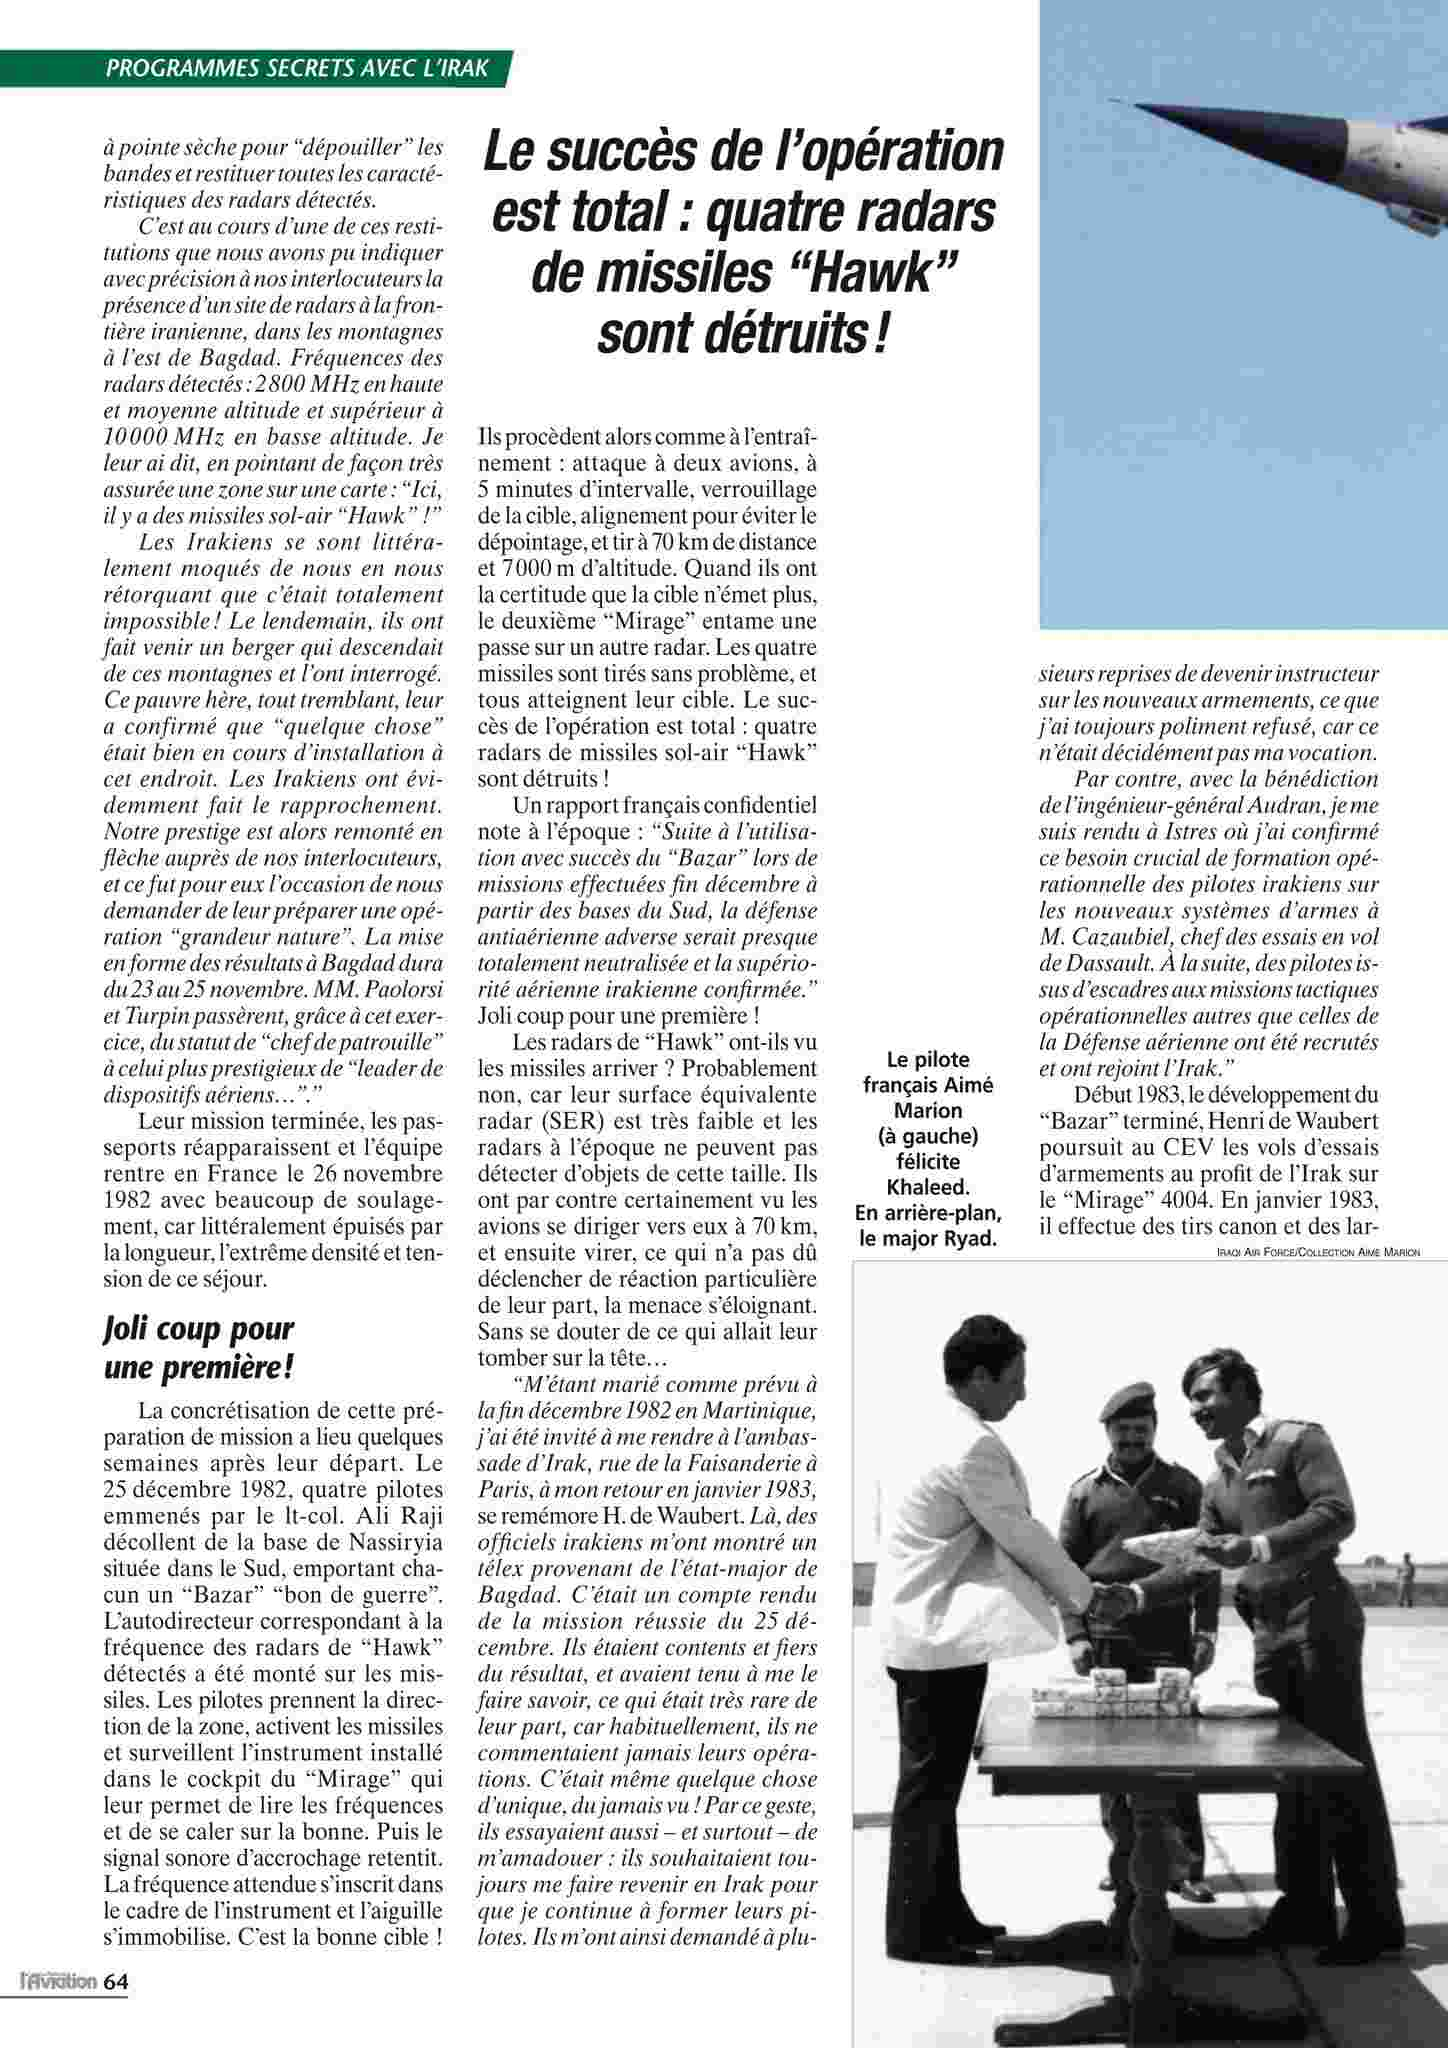 Guerre Iran-Irak - Page 3 A04010